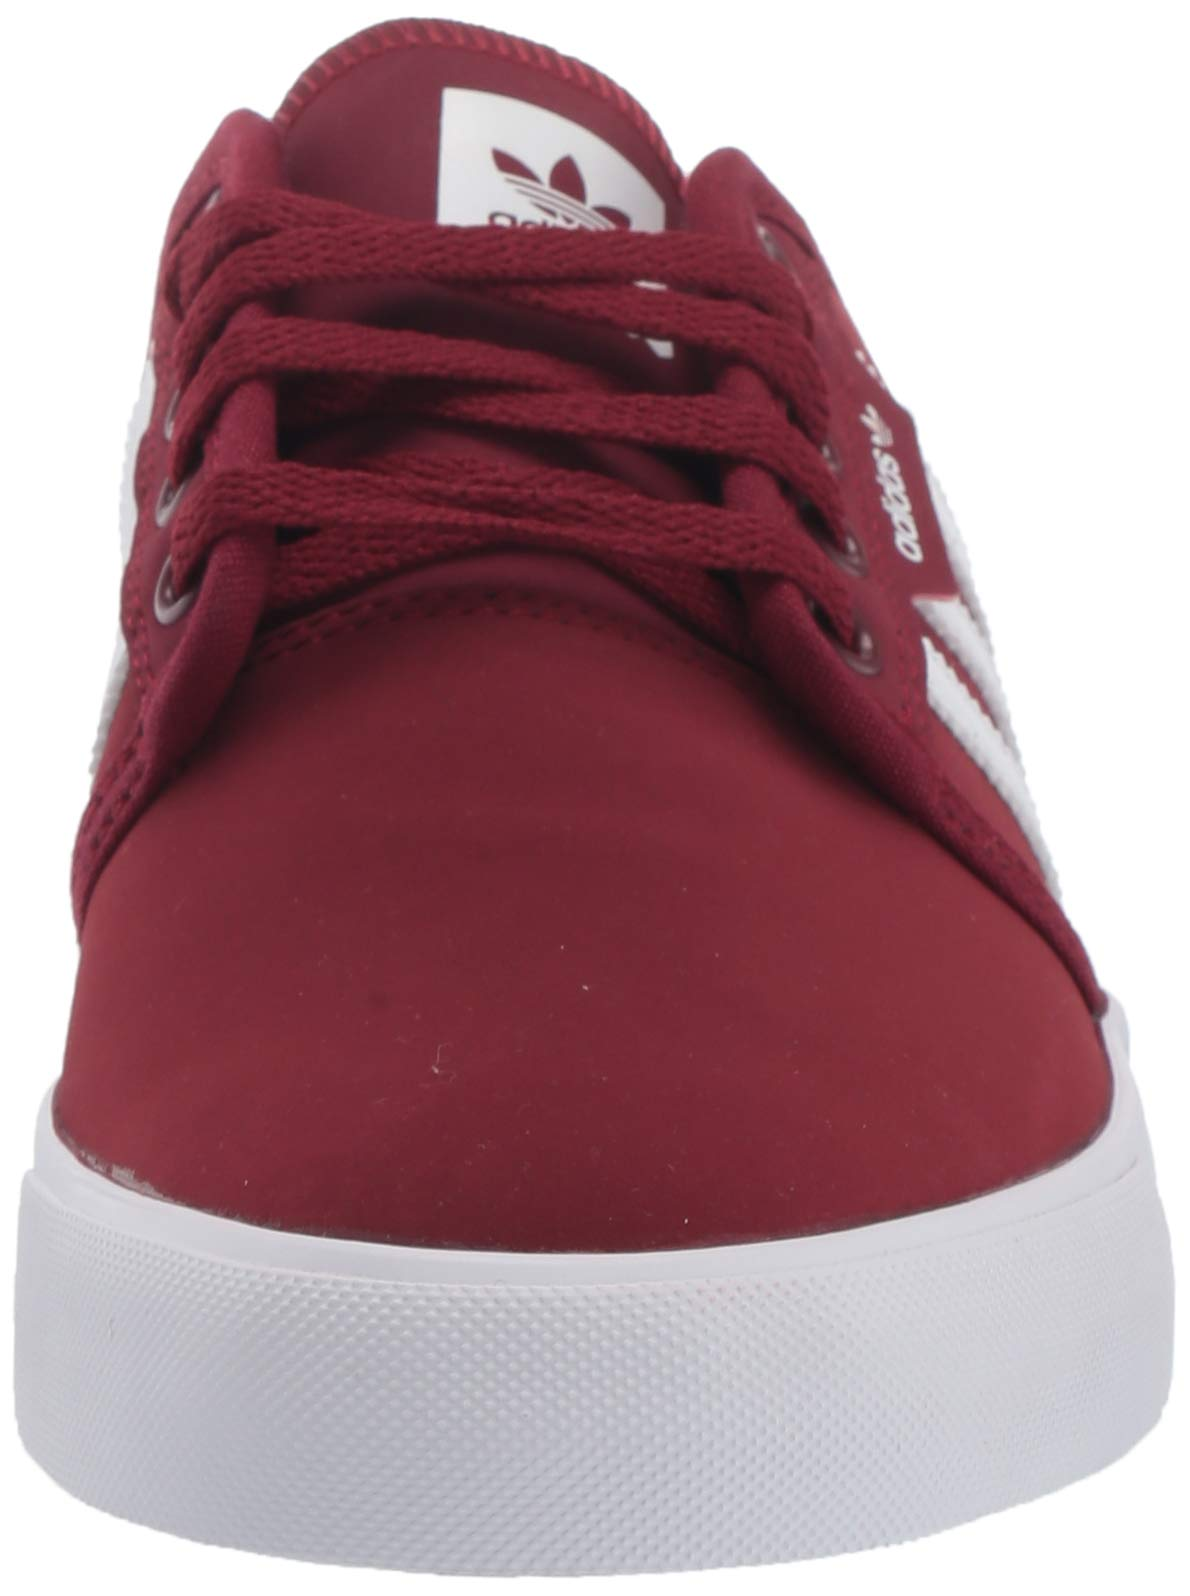 adidas Originals Men's Seeley Sneaker, Collegiate Burgundy/White/White, 13.5 M US